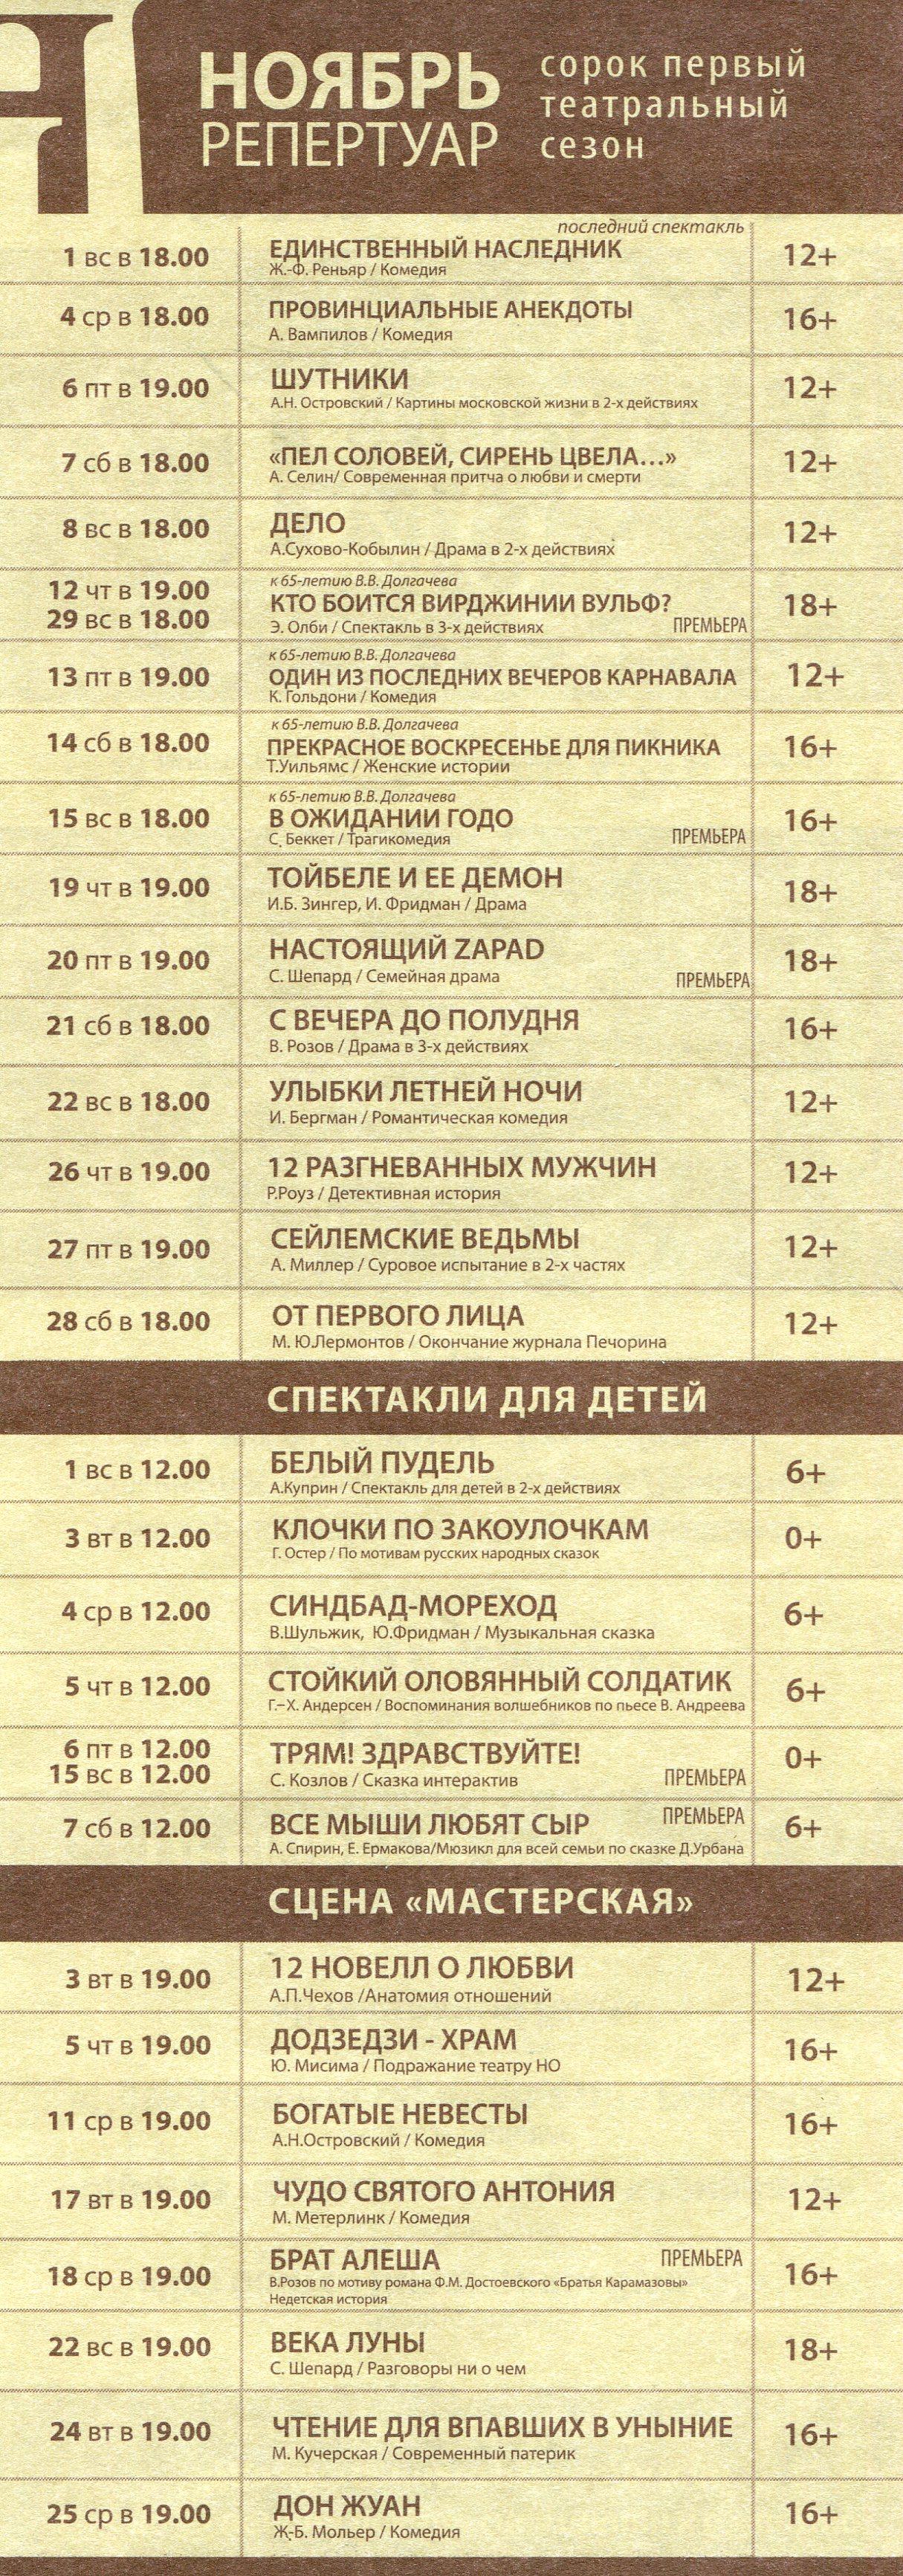 Репертуар Нового театра на Ноябрь 2015-го года